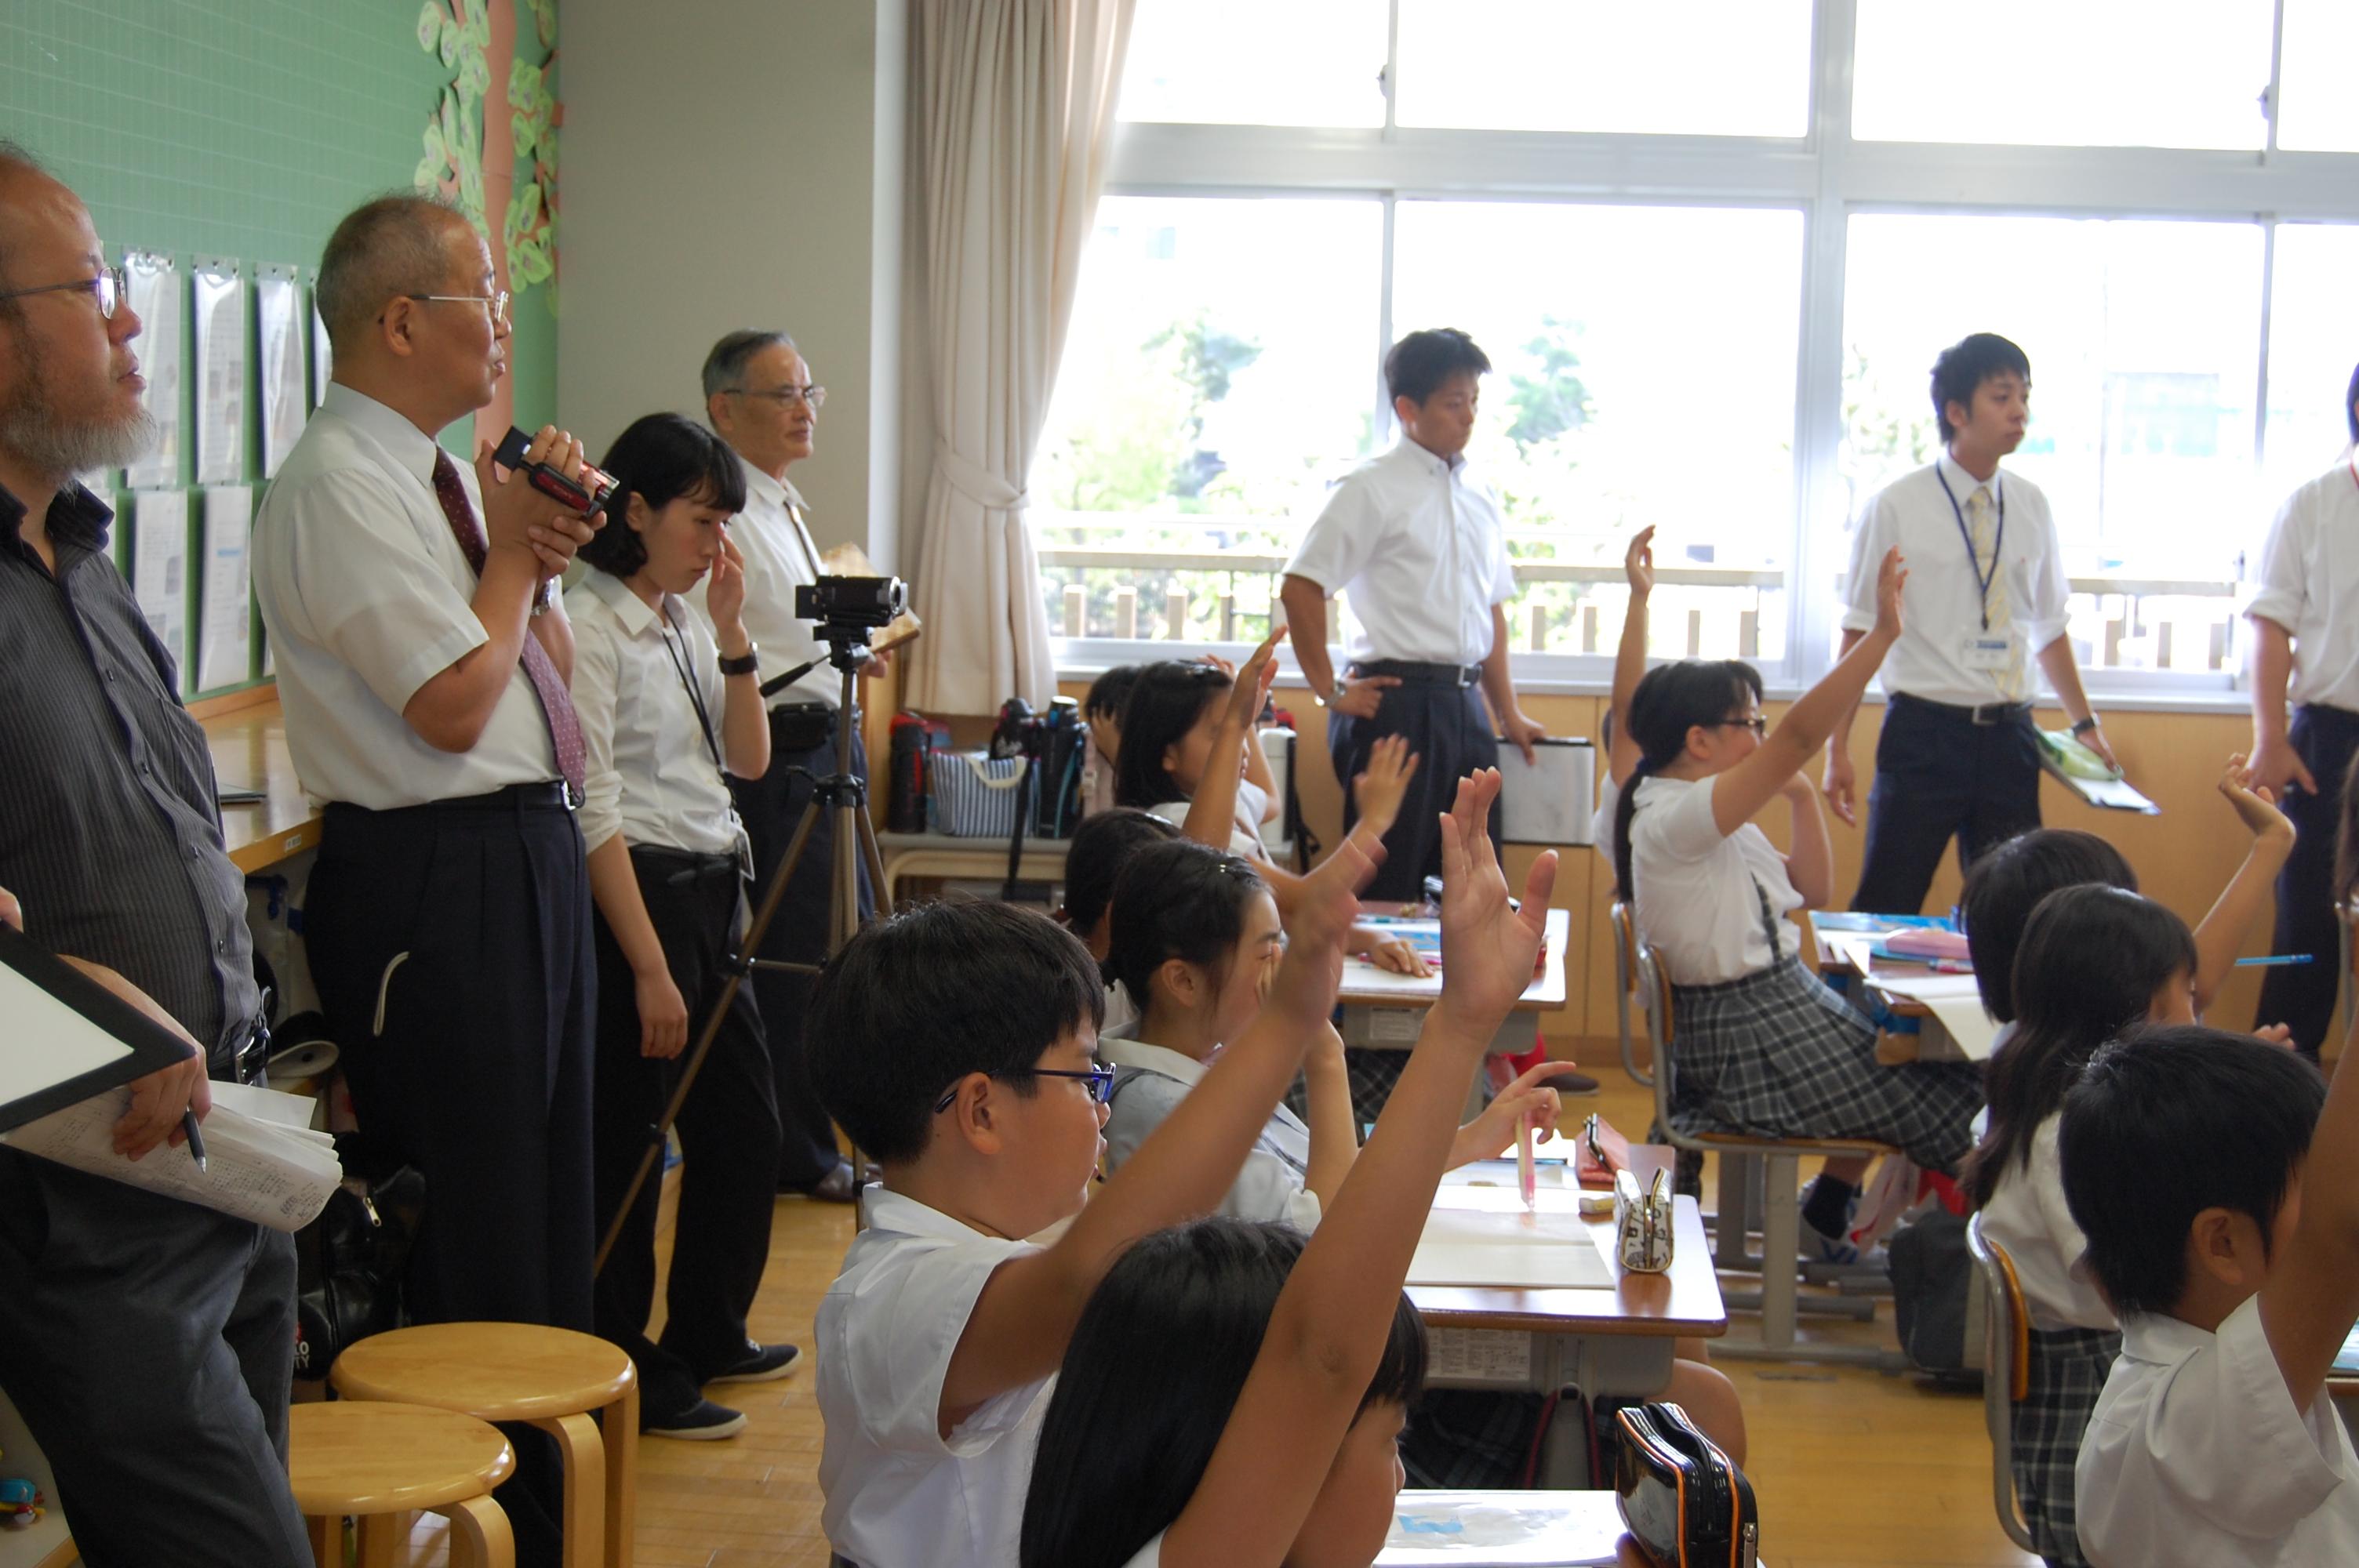 http://www.shotoku.ac.jp/el/daily-snap/images/8.30sansuu1.JPG